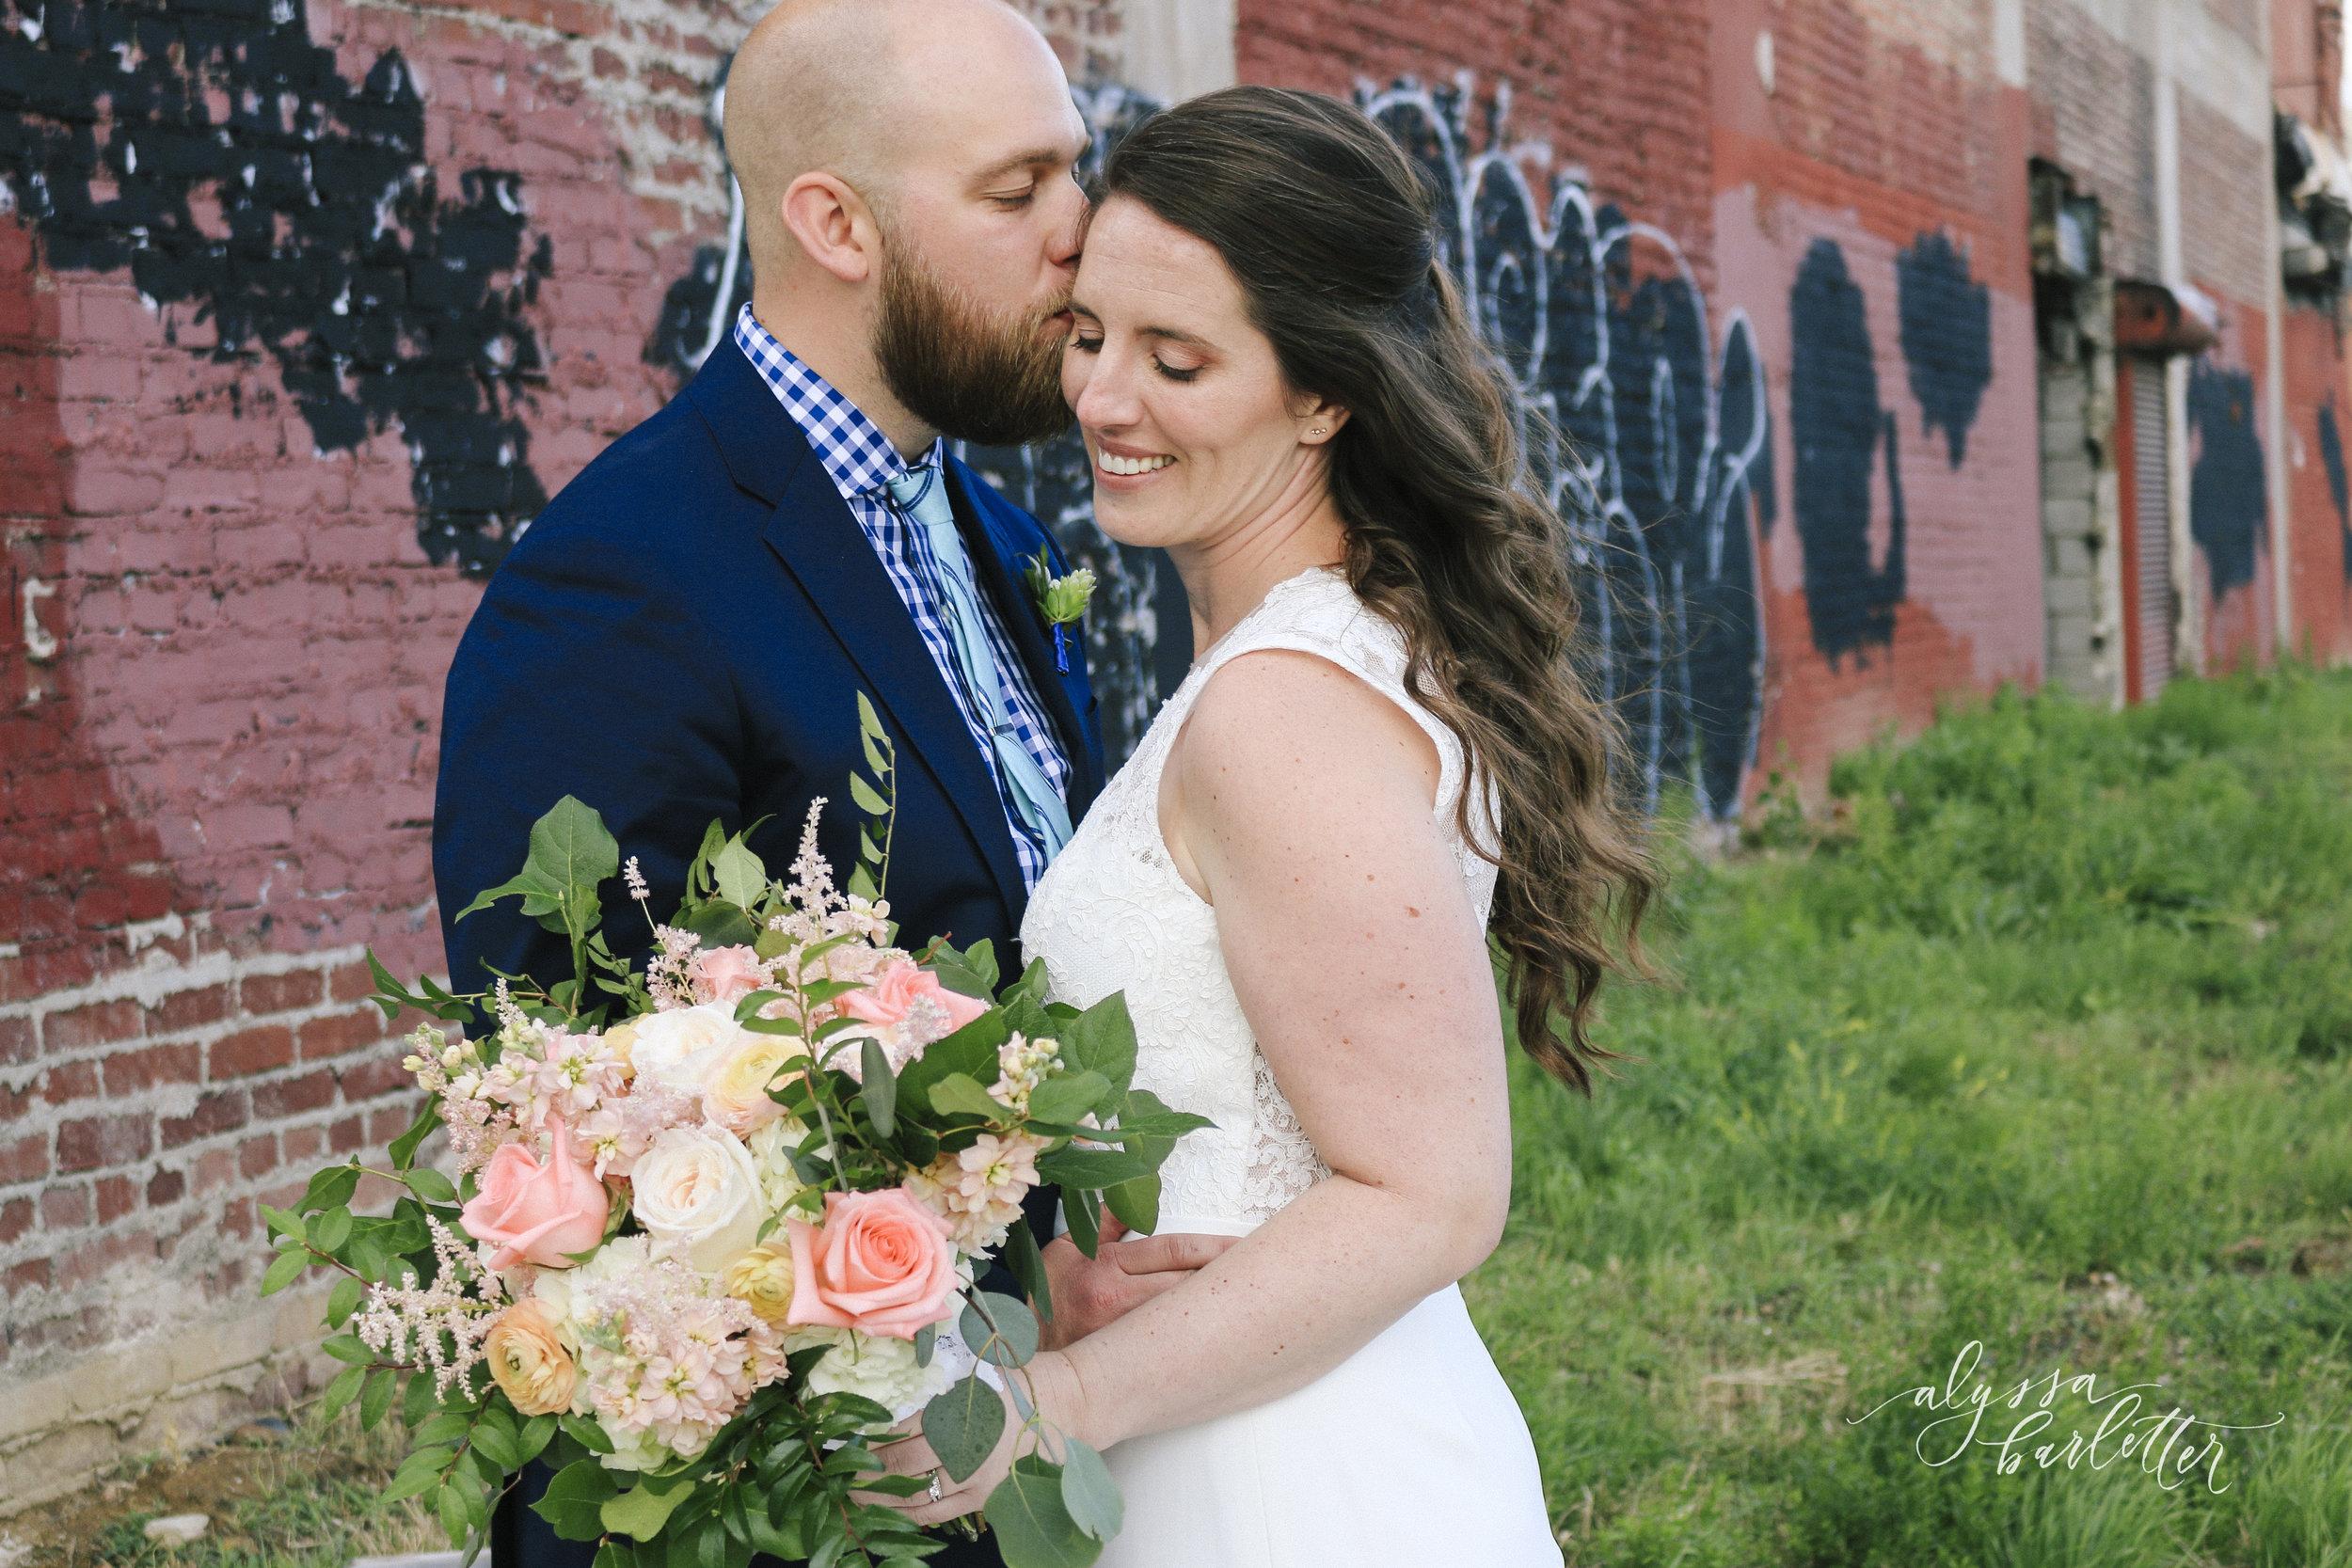 alyssa barletter photography kansas city wedding 2016 main courtney and brian-1-33.jpg